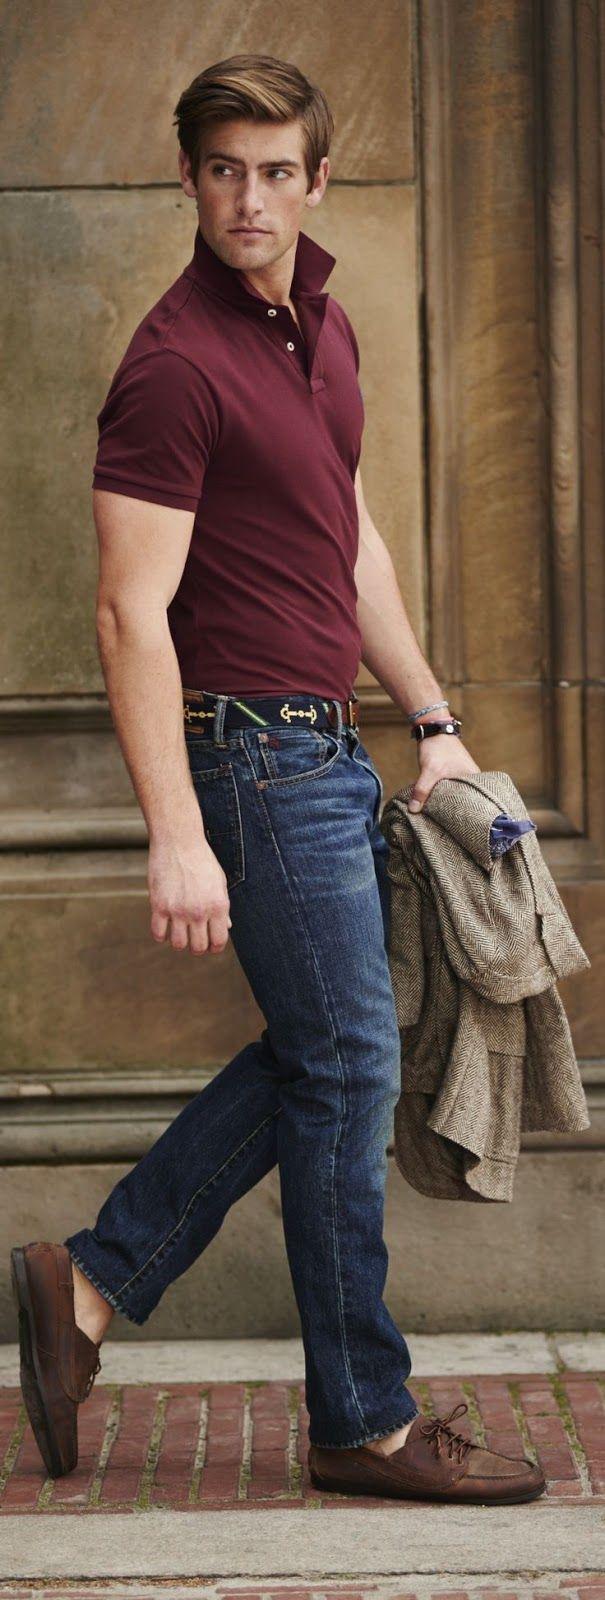 moda2Bhombre-jeans-azul-y-classic-polo-camisa-and-zapato-1.jpg (605×1600)